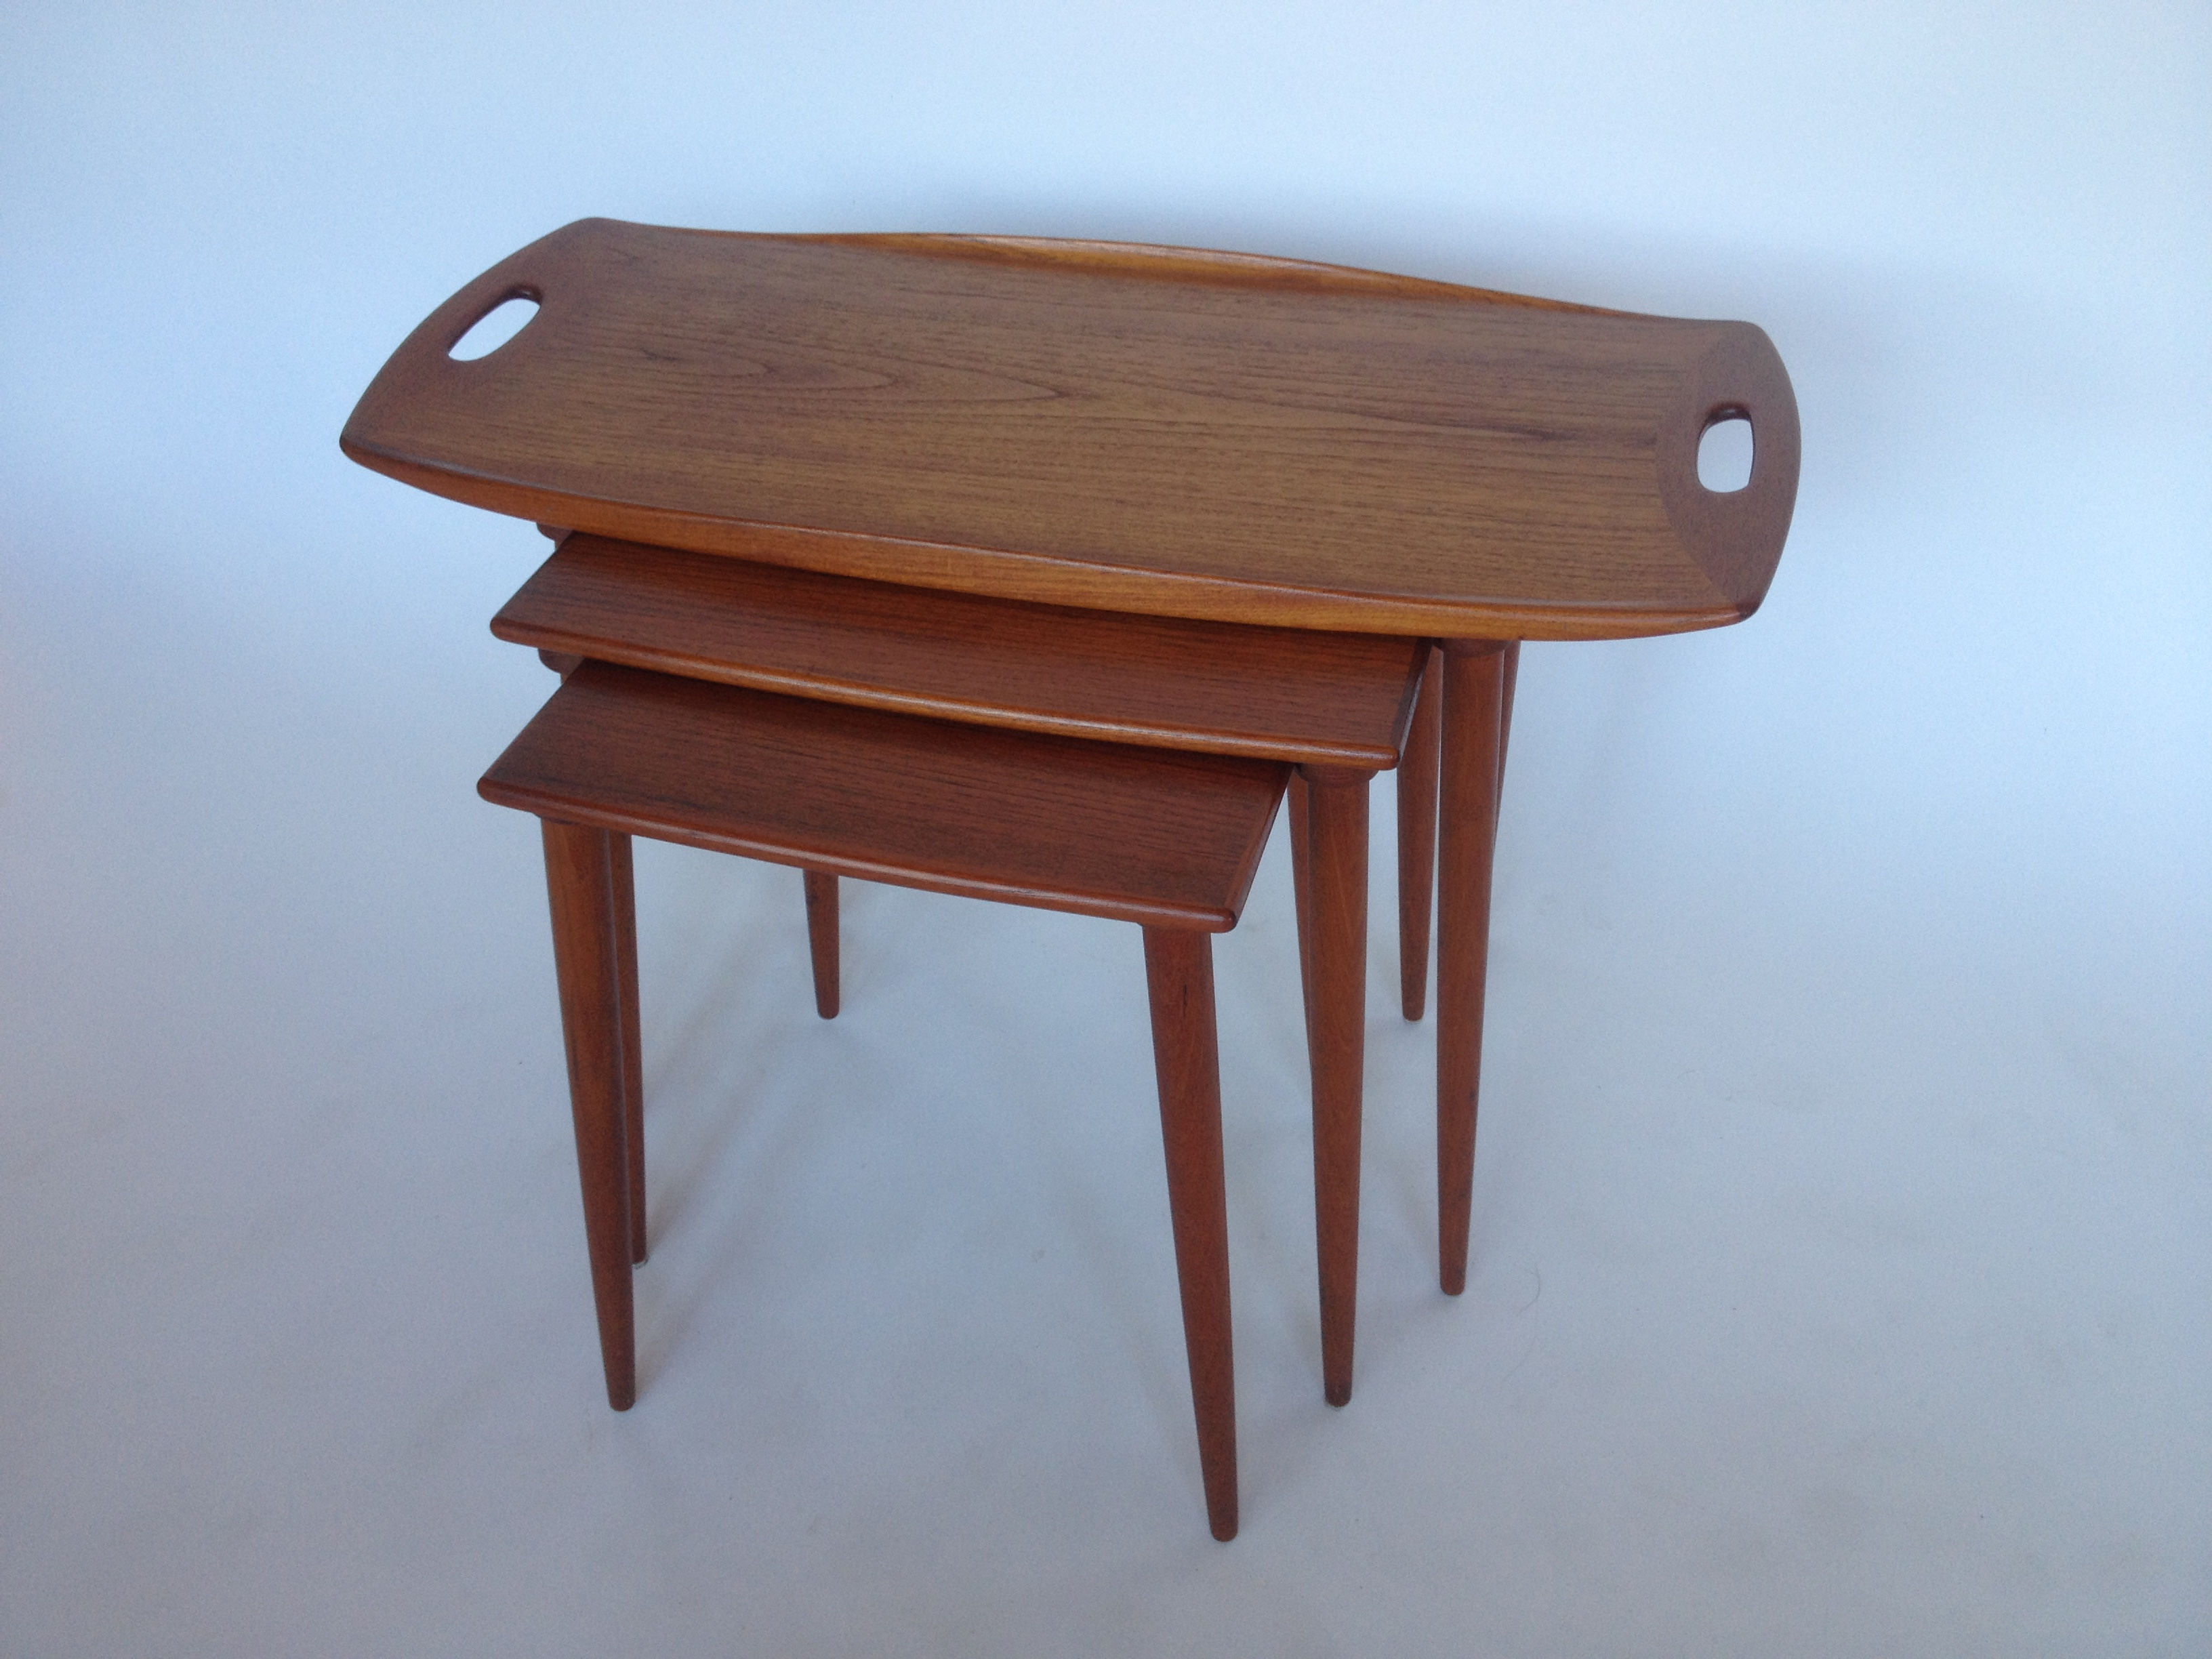 Exquisite Sculptural Set of Danish Modern Teak Nesting Tables Designed by  Jens Quistgaard for Nissen. The Fabulous Find   Mid Century Modern Furniture Showroom in